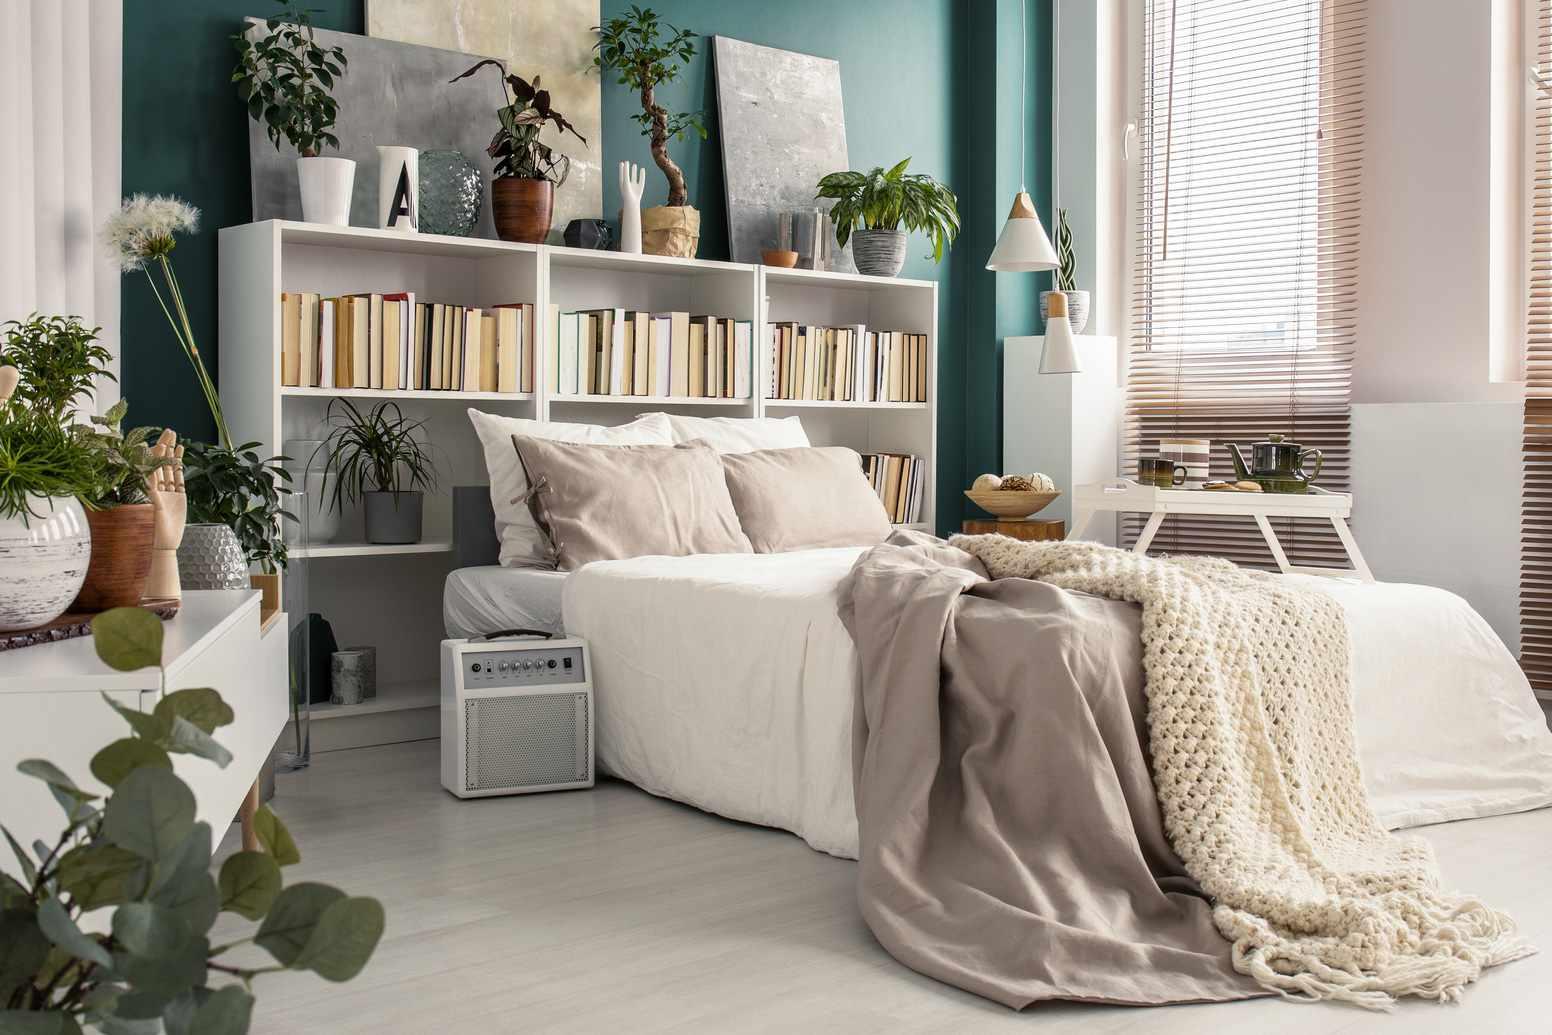 bookshelf behind a bed